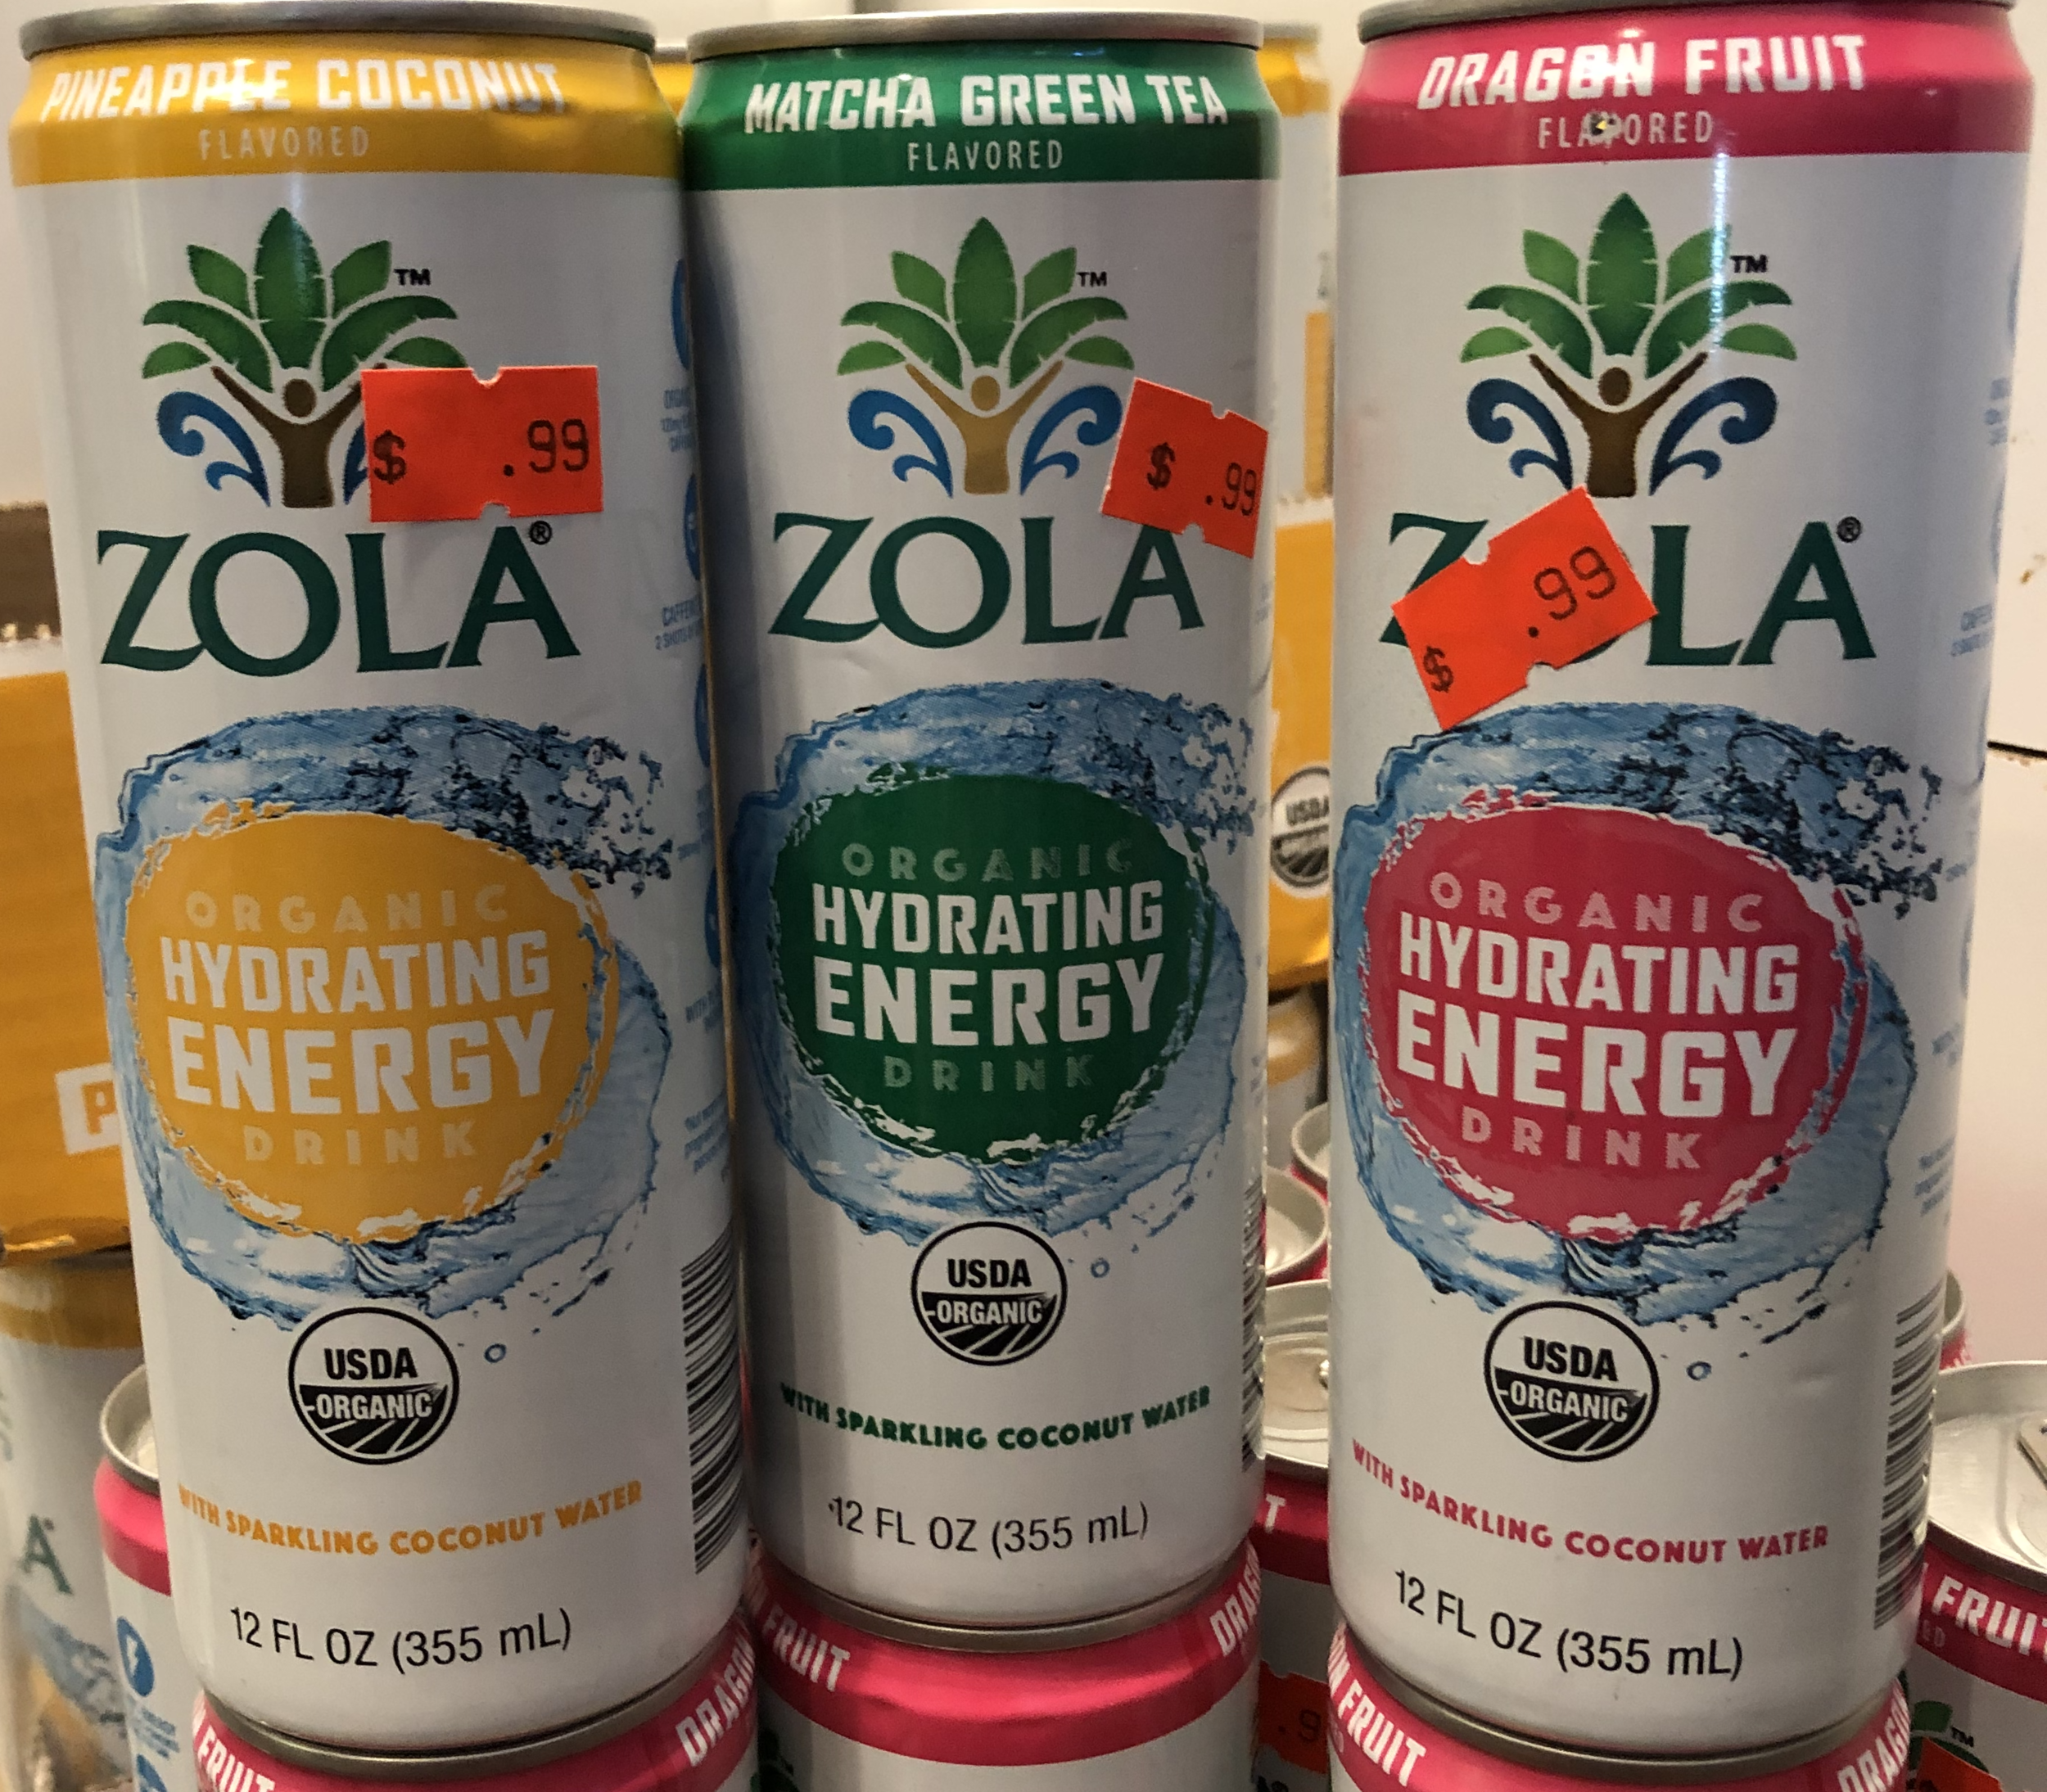 ZOLA Organic Hydrating Energy Drink - Pineapple Coconut, Matcha Green Tea, Dragon Fruit